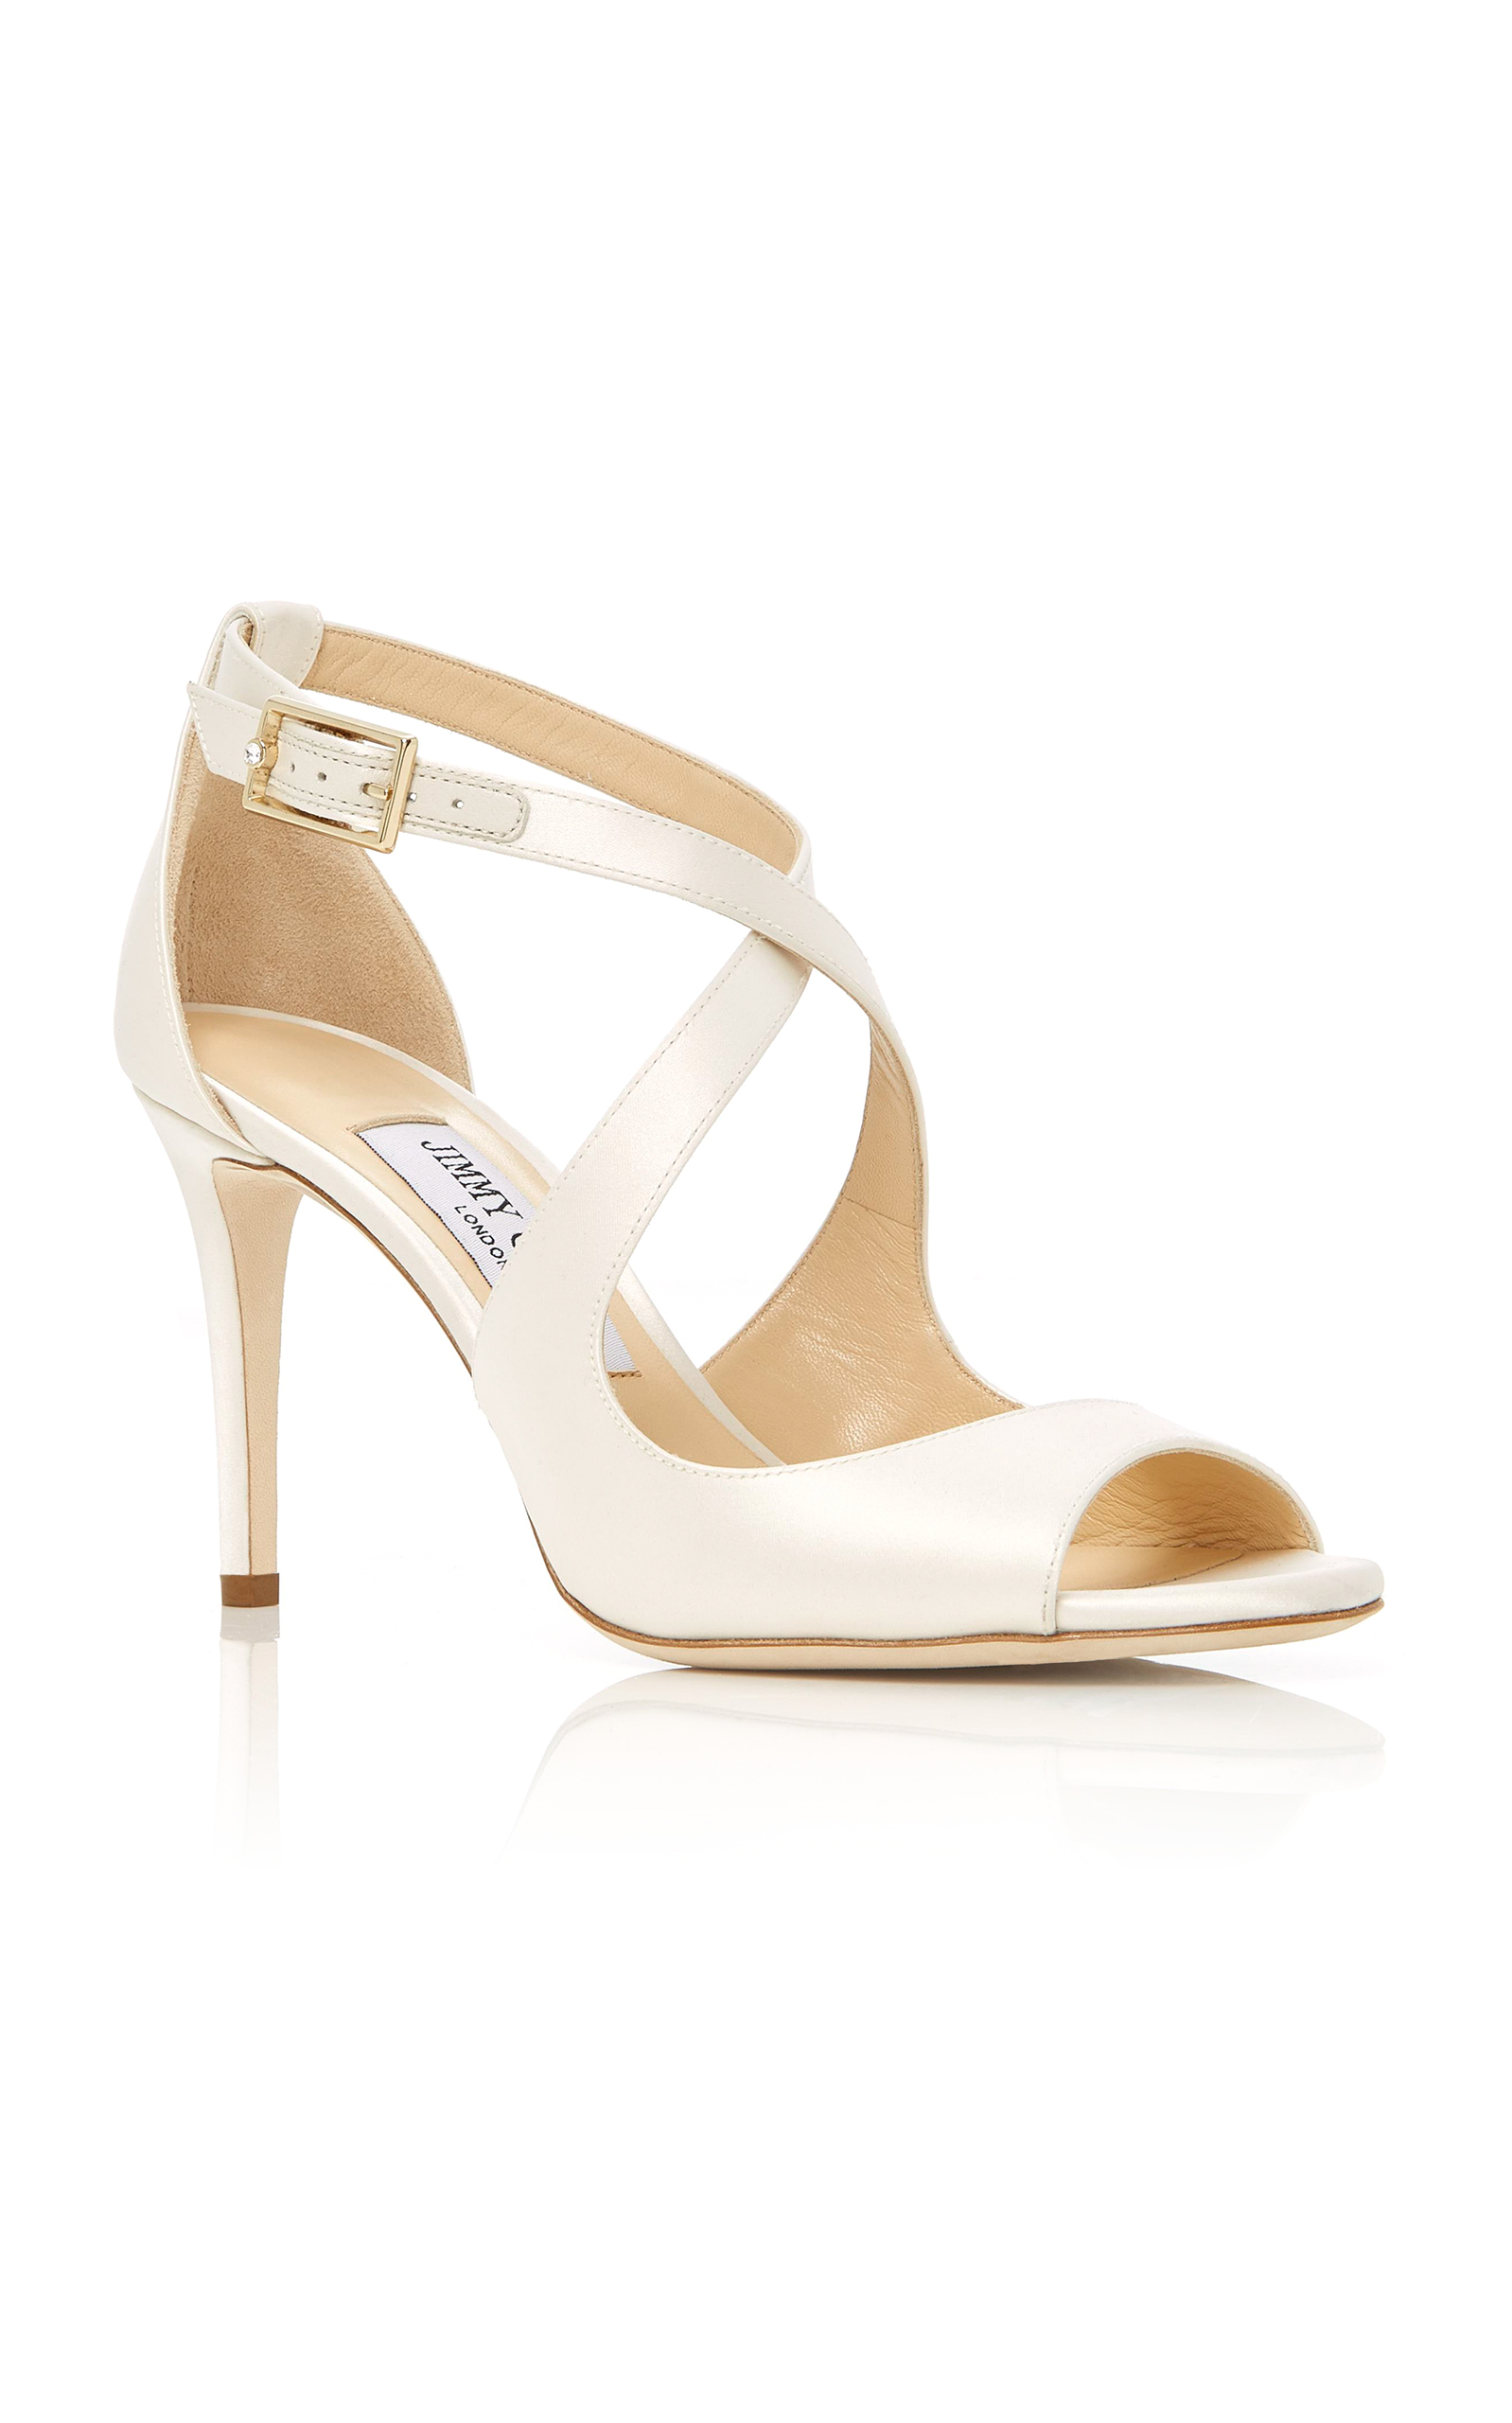 jimmy choo r18 jimmy choo wedding shoes